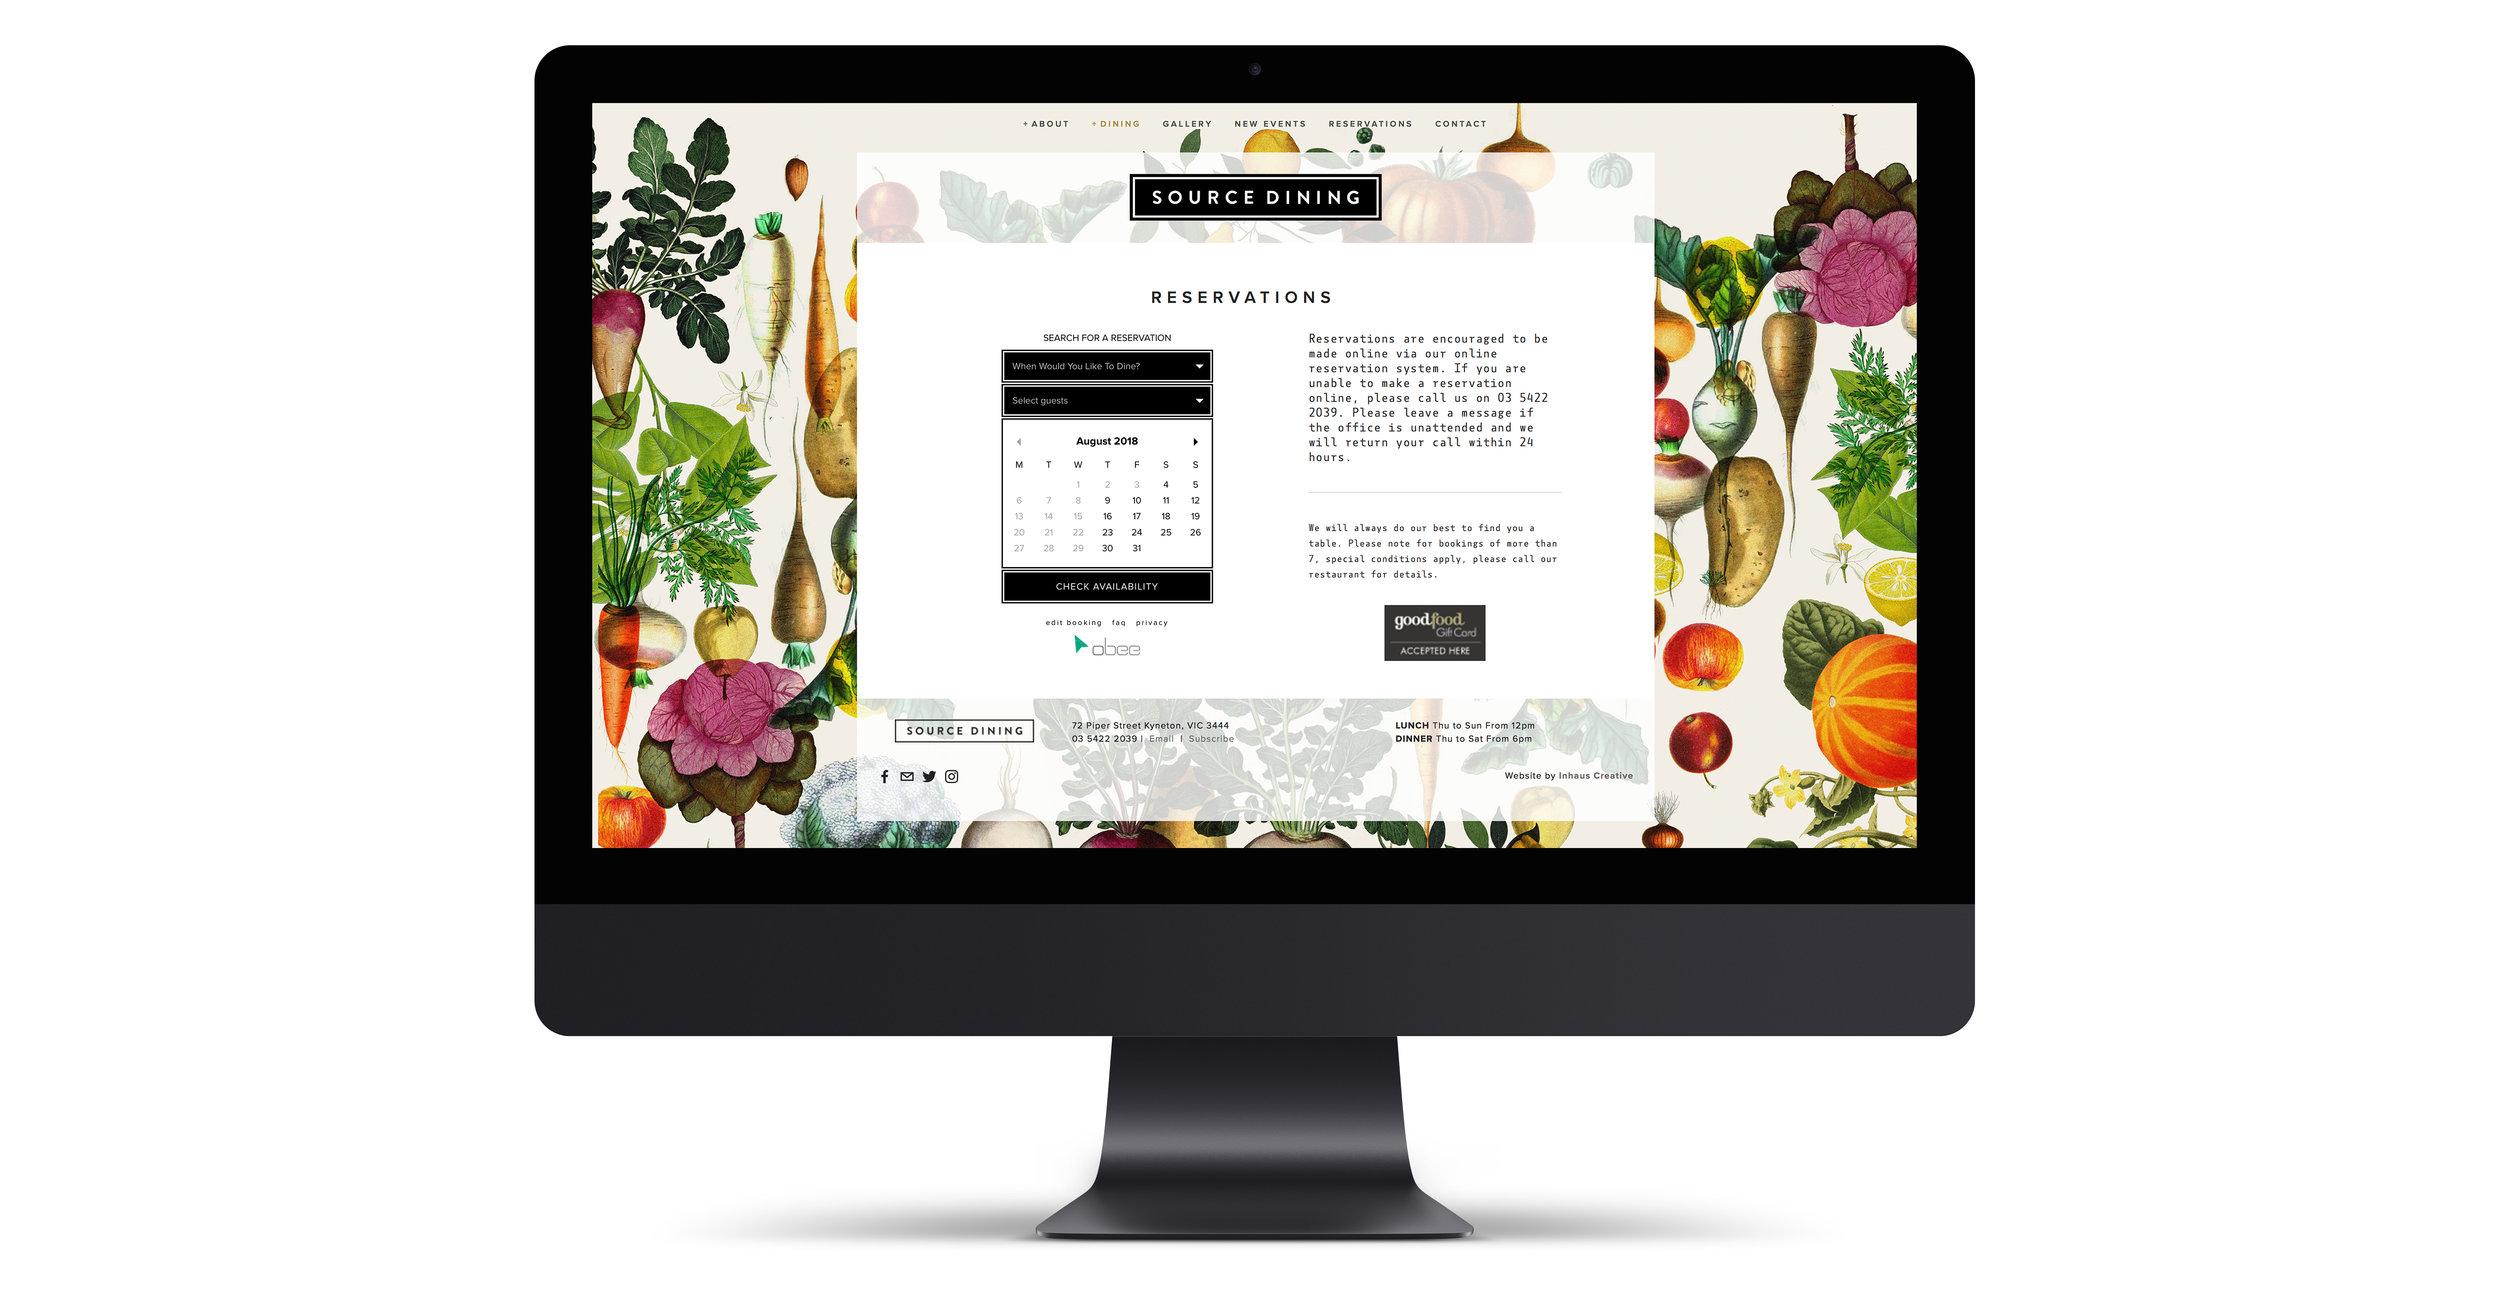 iMac-Pro-Mockup_websites_source.jpg